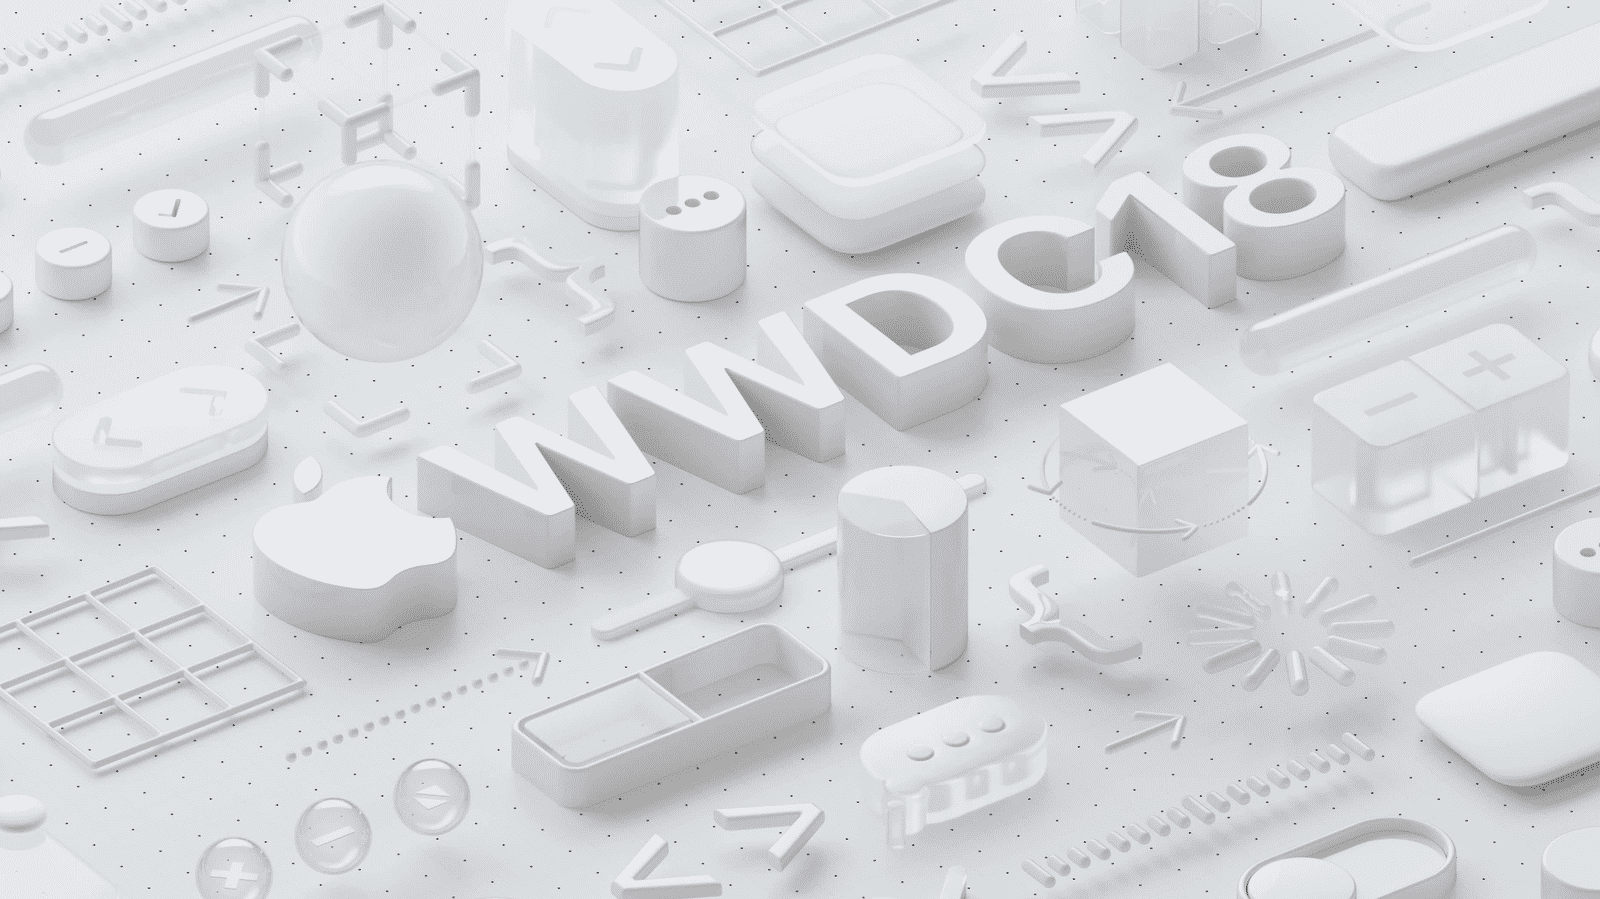 Logo der WWDC 2018